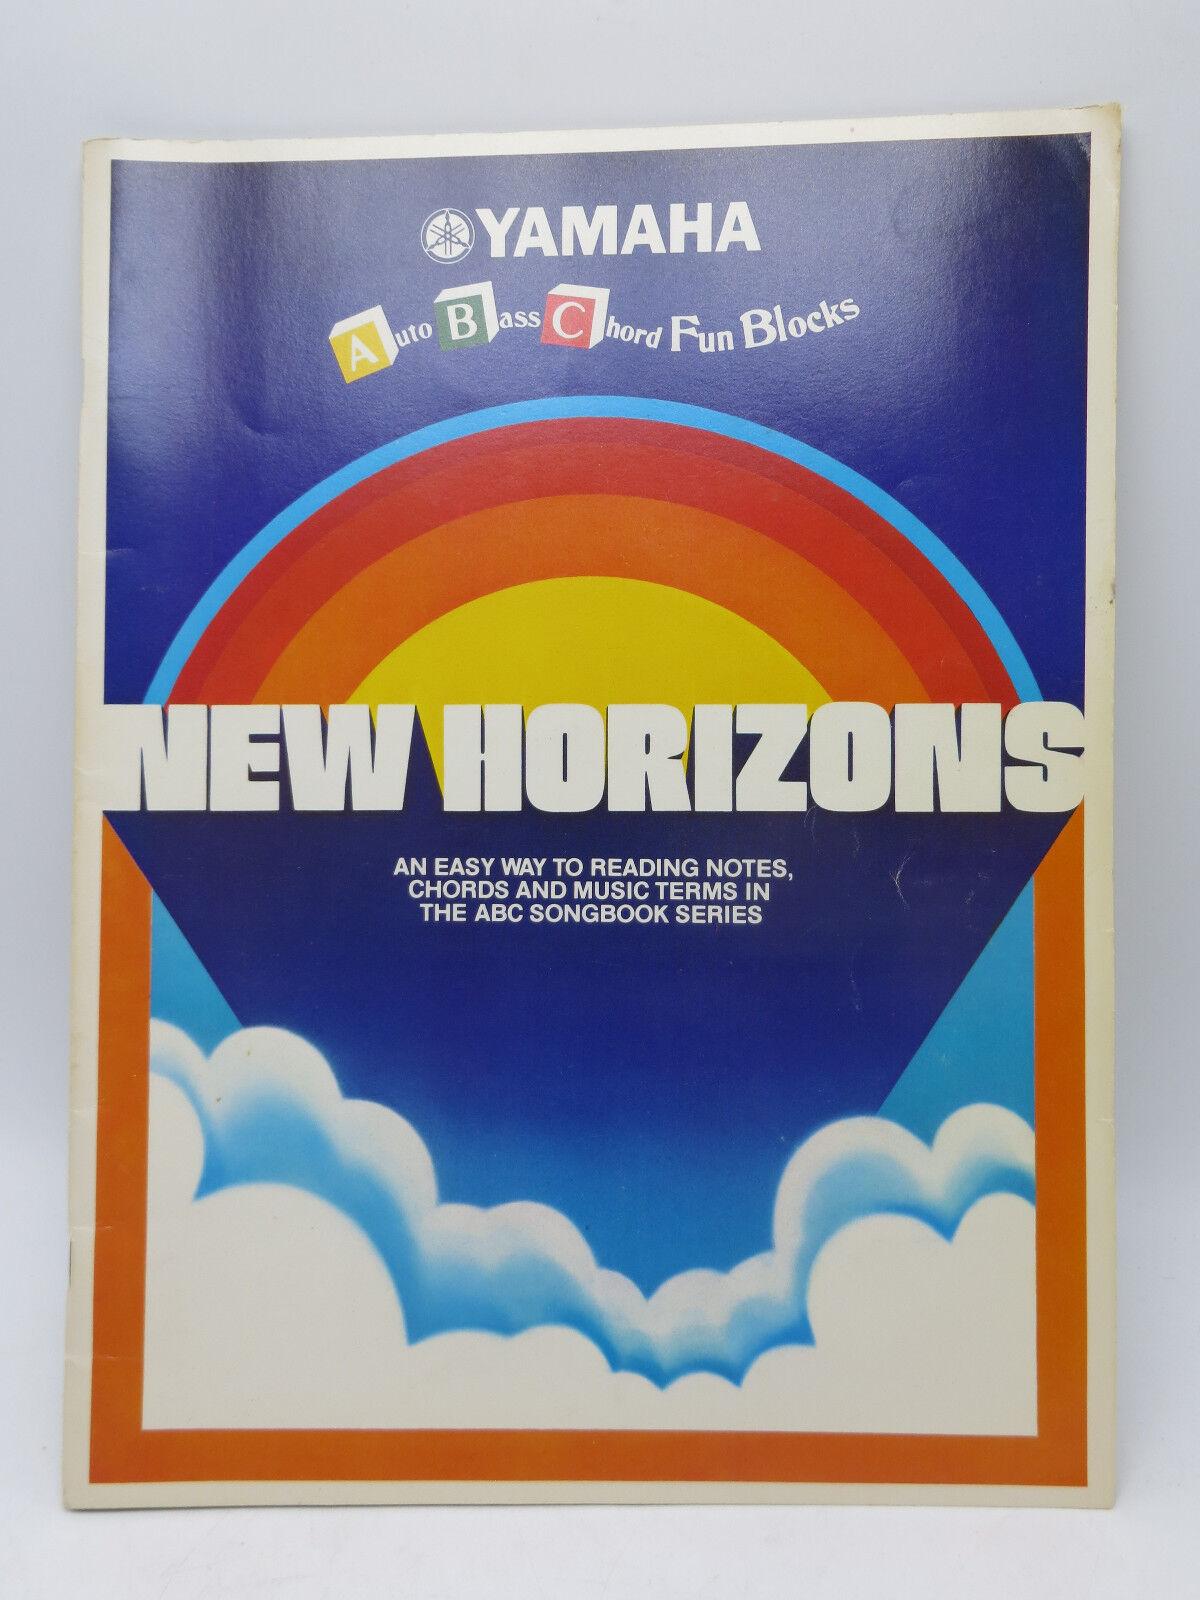 Details about Yamaha Auto Bass Chord Fun Blocks New Horizons Vintage  Paperback Organ Song Book